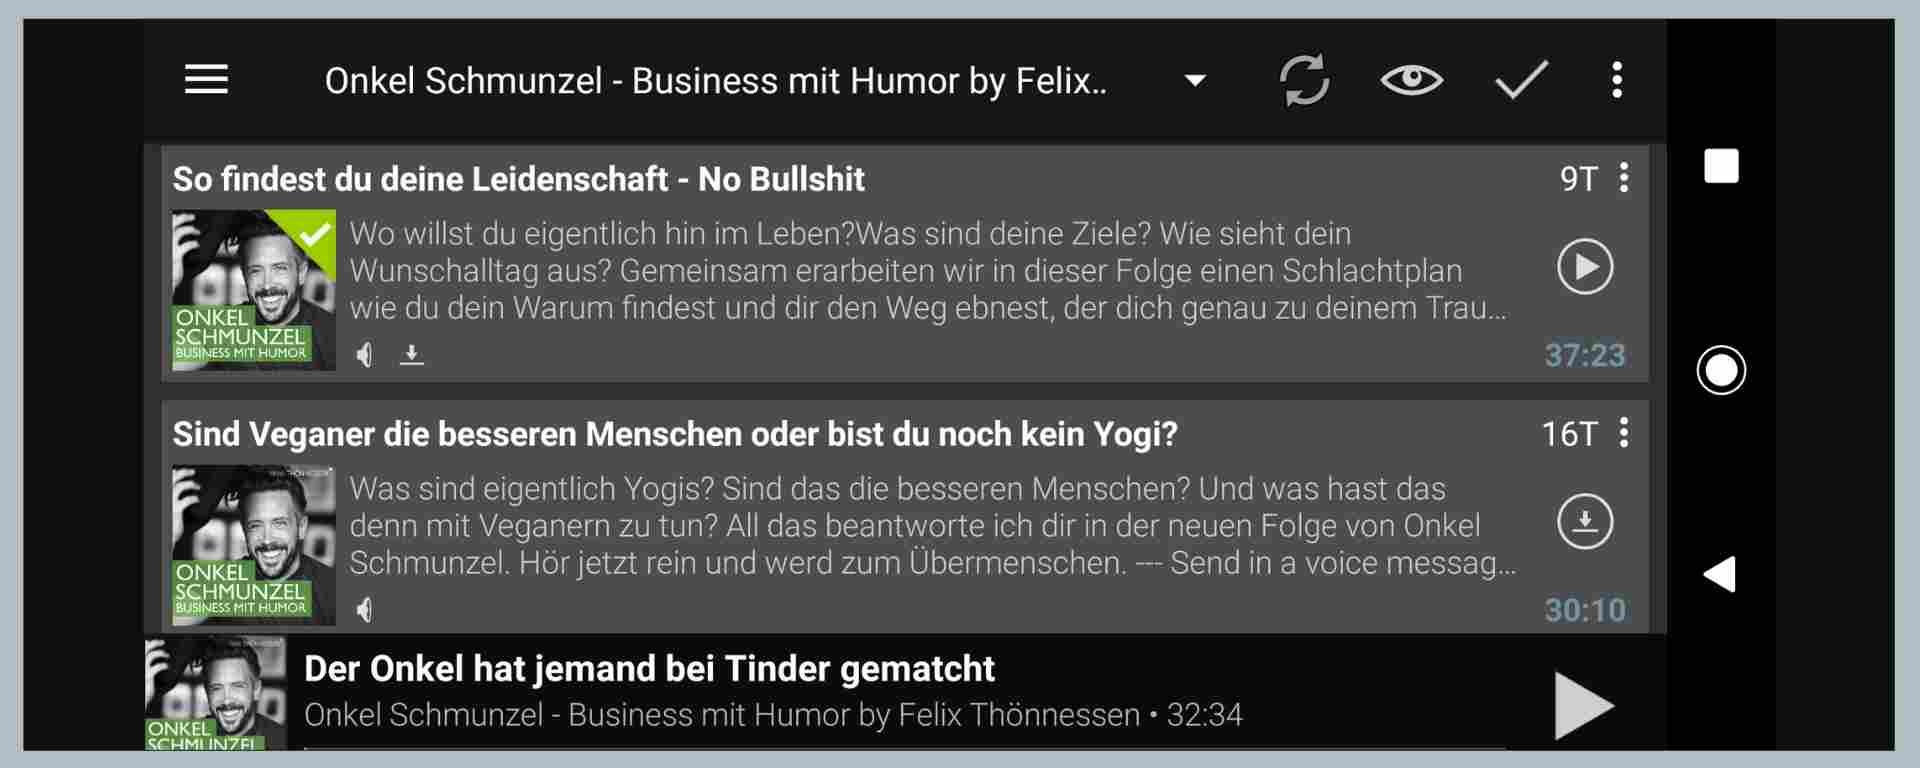 Onkel-Schmunzel-Podcast (Podcast-App-Ansicht)